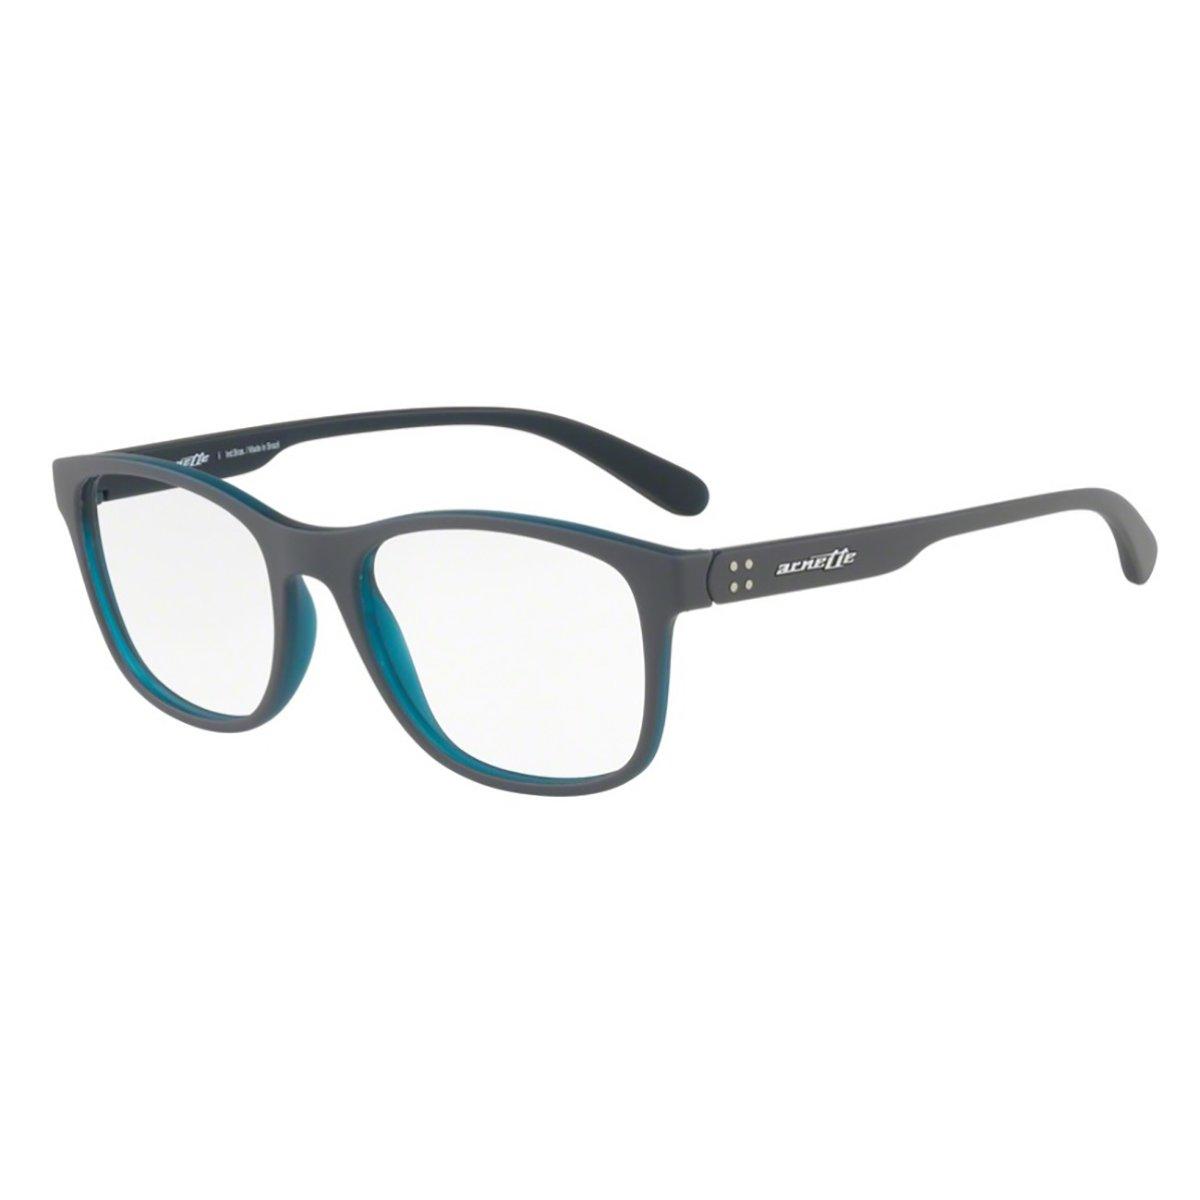 Compre Óculos de Grau Arnette em 10X   Tri-Jóia Shop c985afa30d